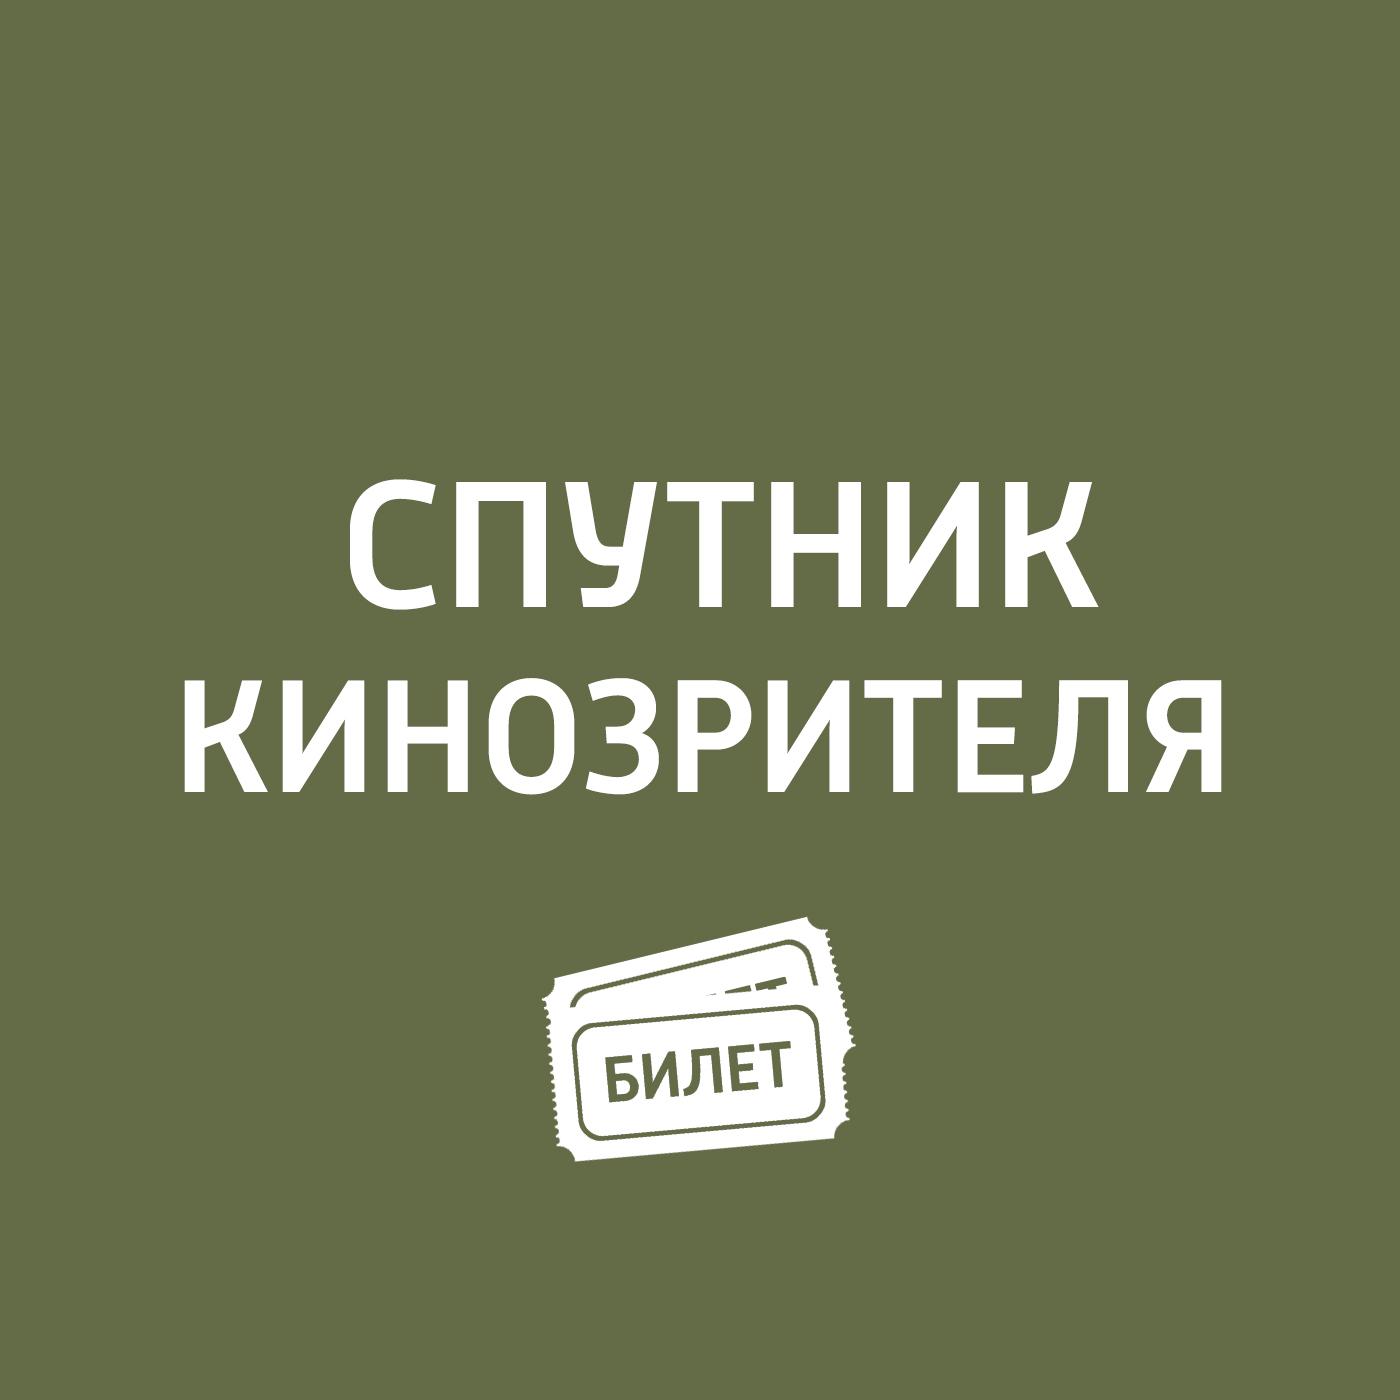 Антон Долин Неудержимые-3, «Красотки Парижа href